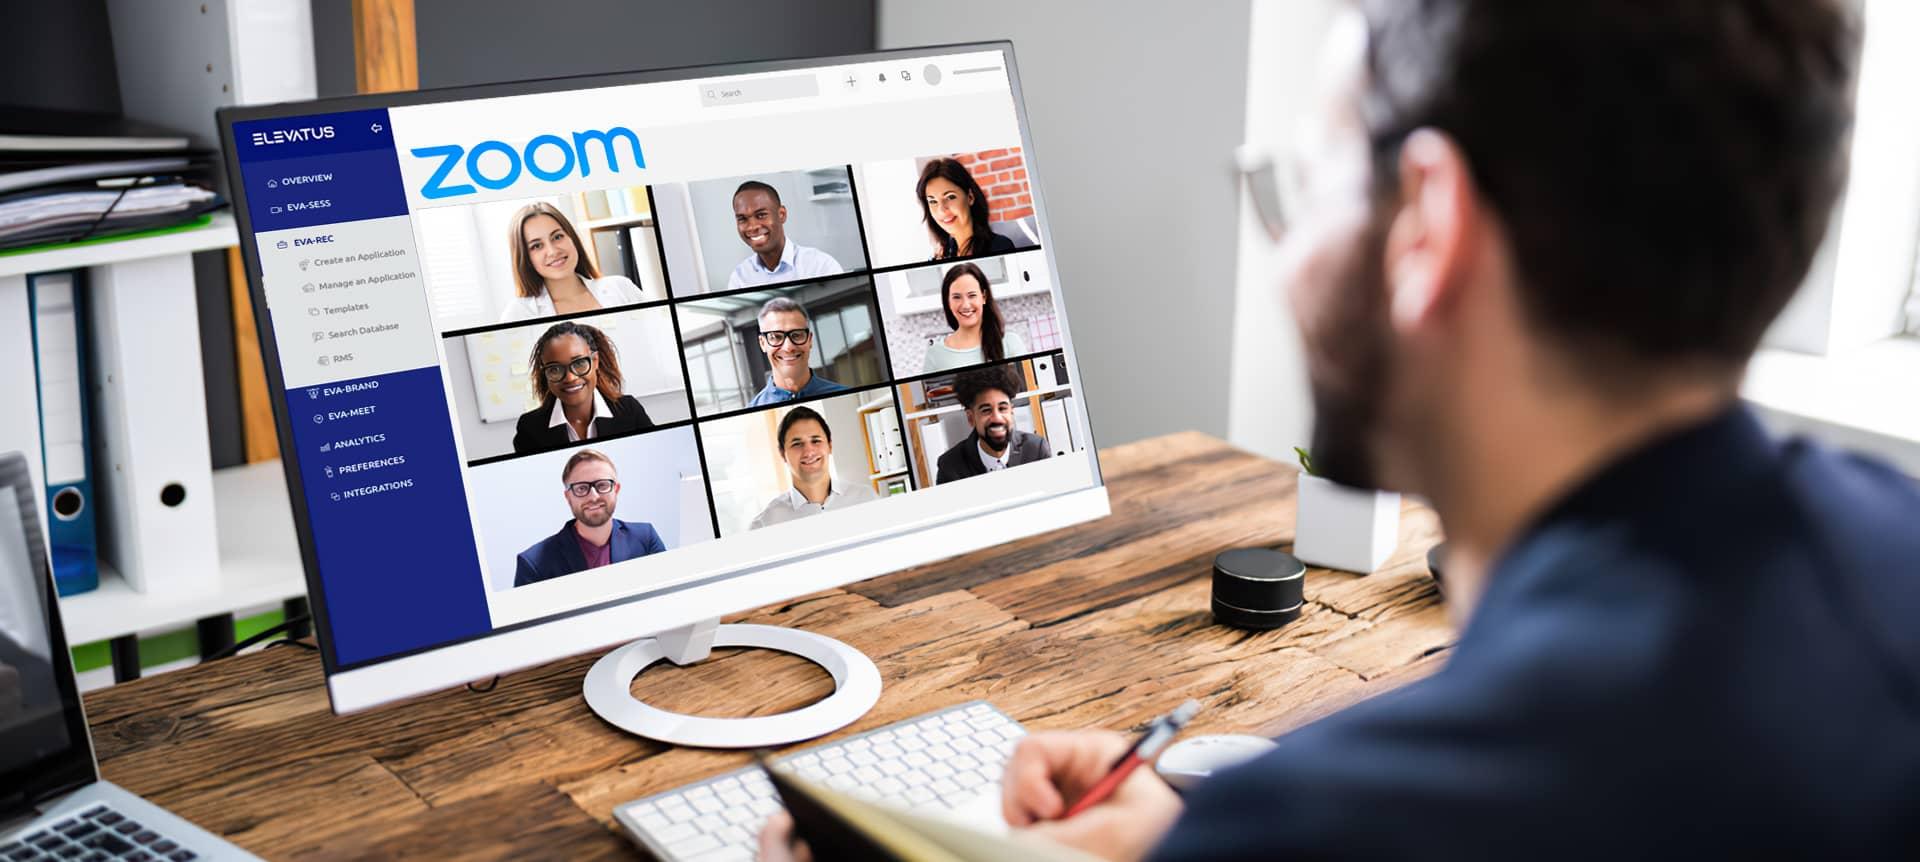 A recruiter using video interviewing software